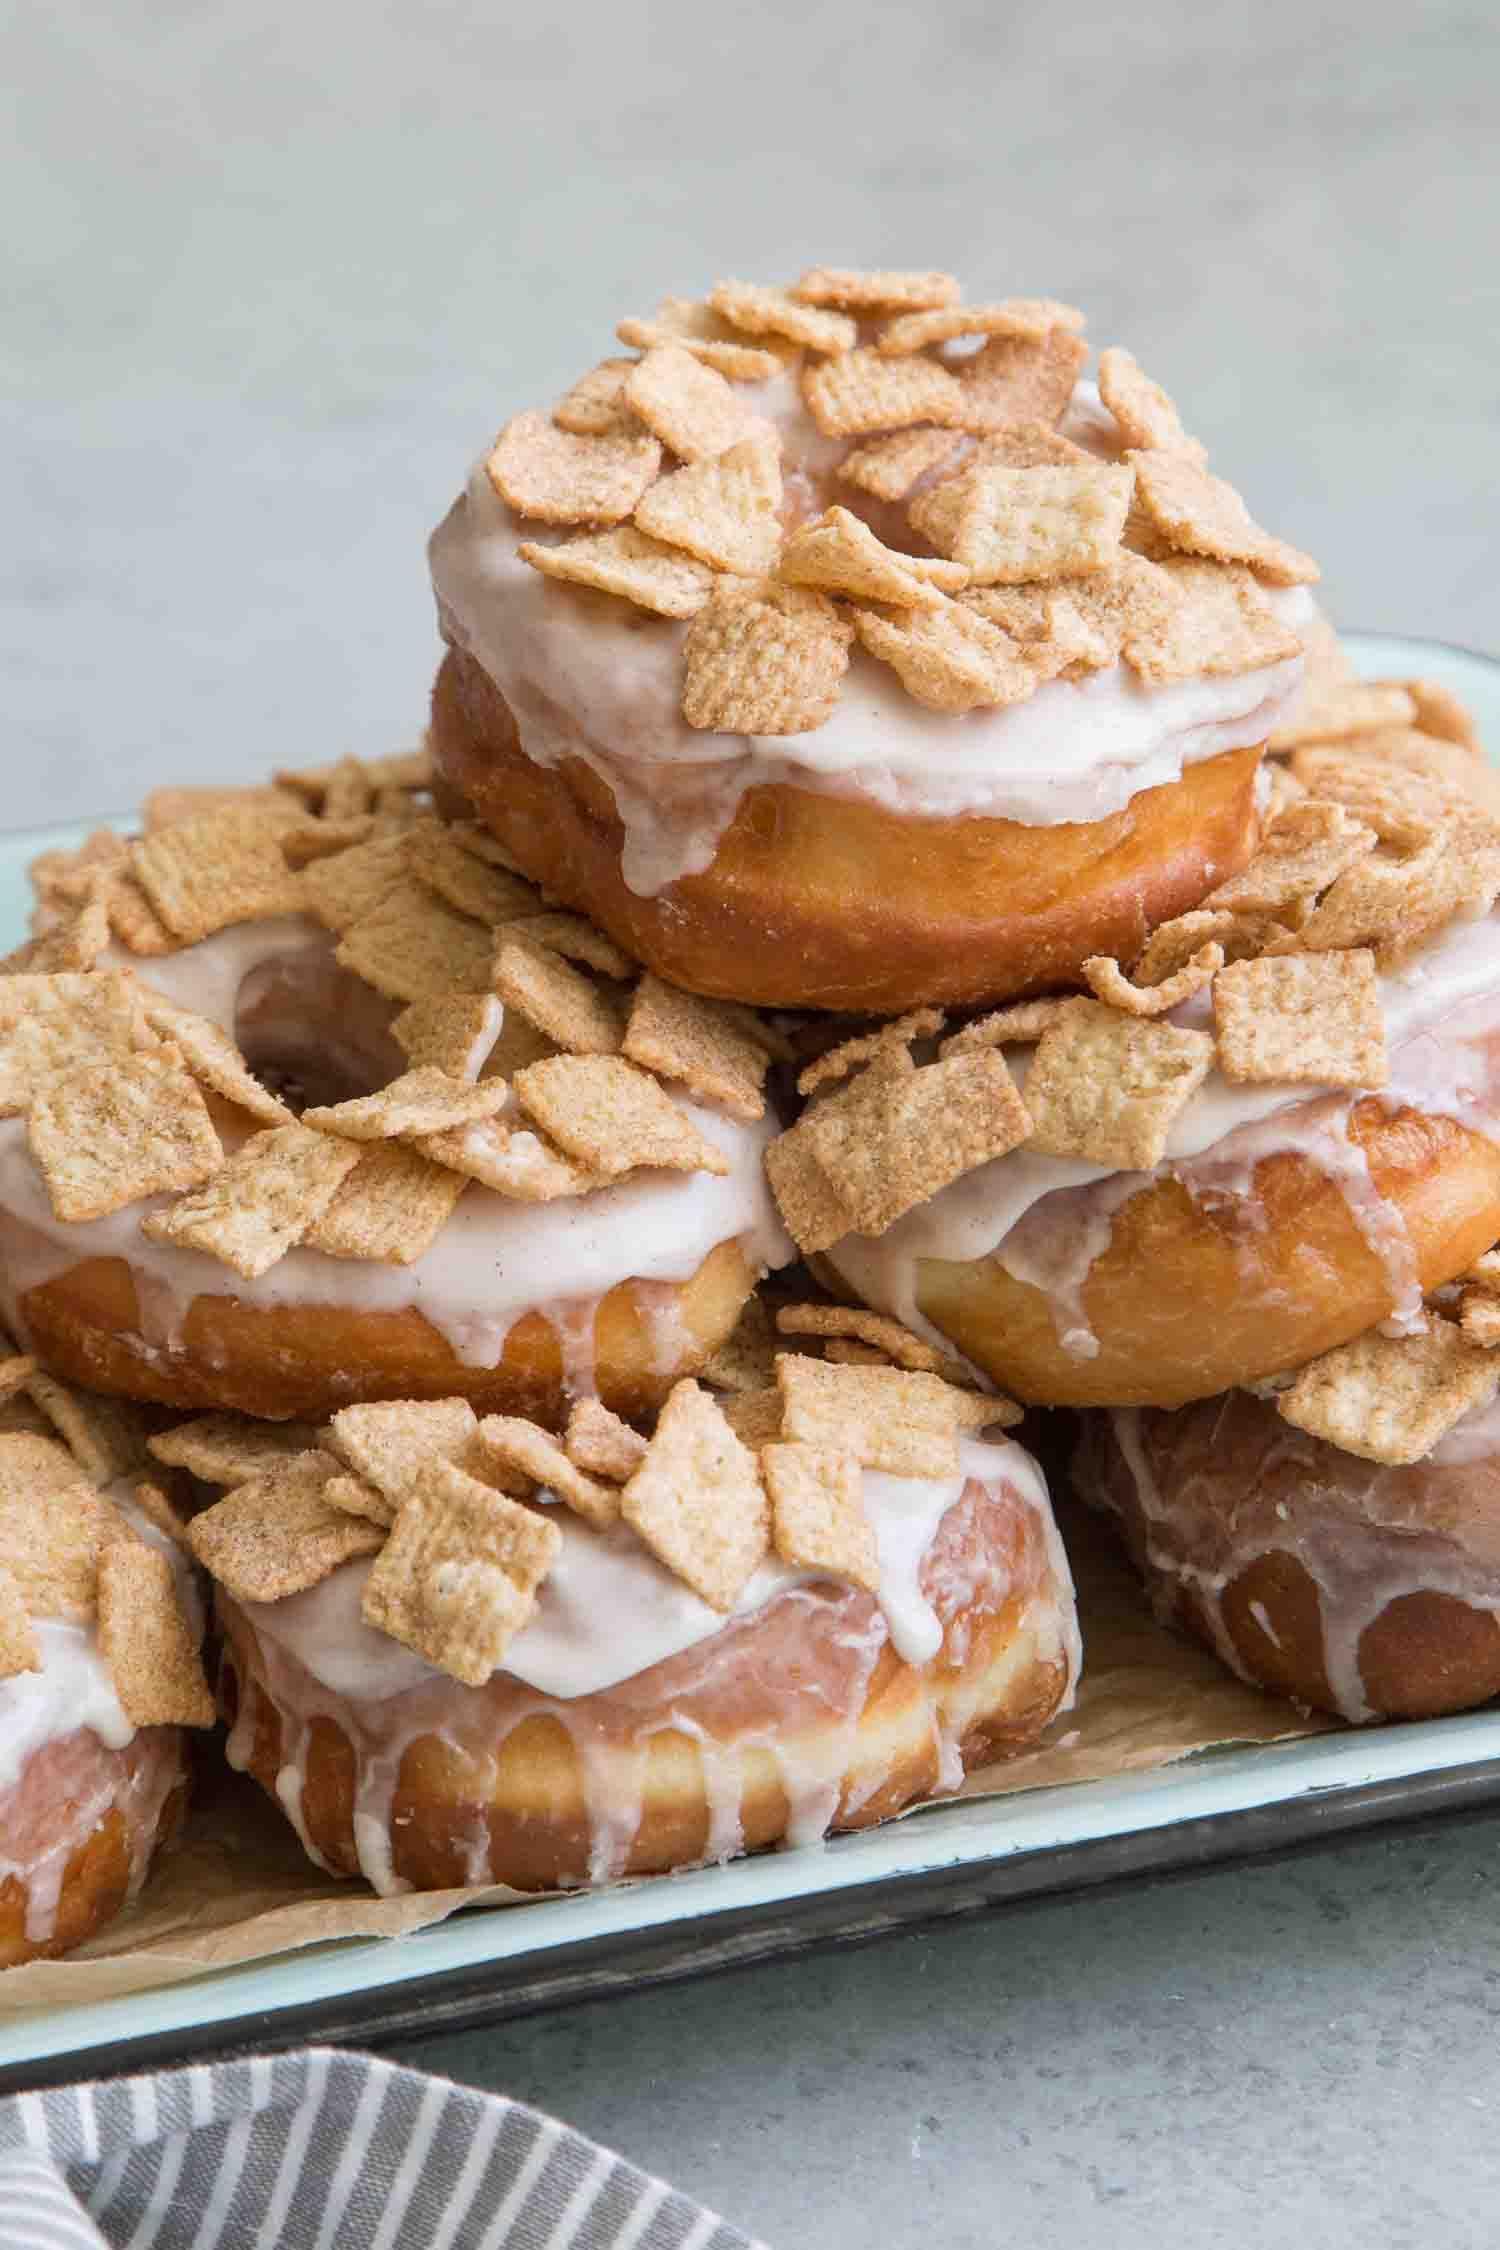 Cinnamon Toast Crunch Doughnuts- The Little Epicurean